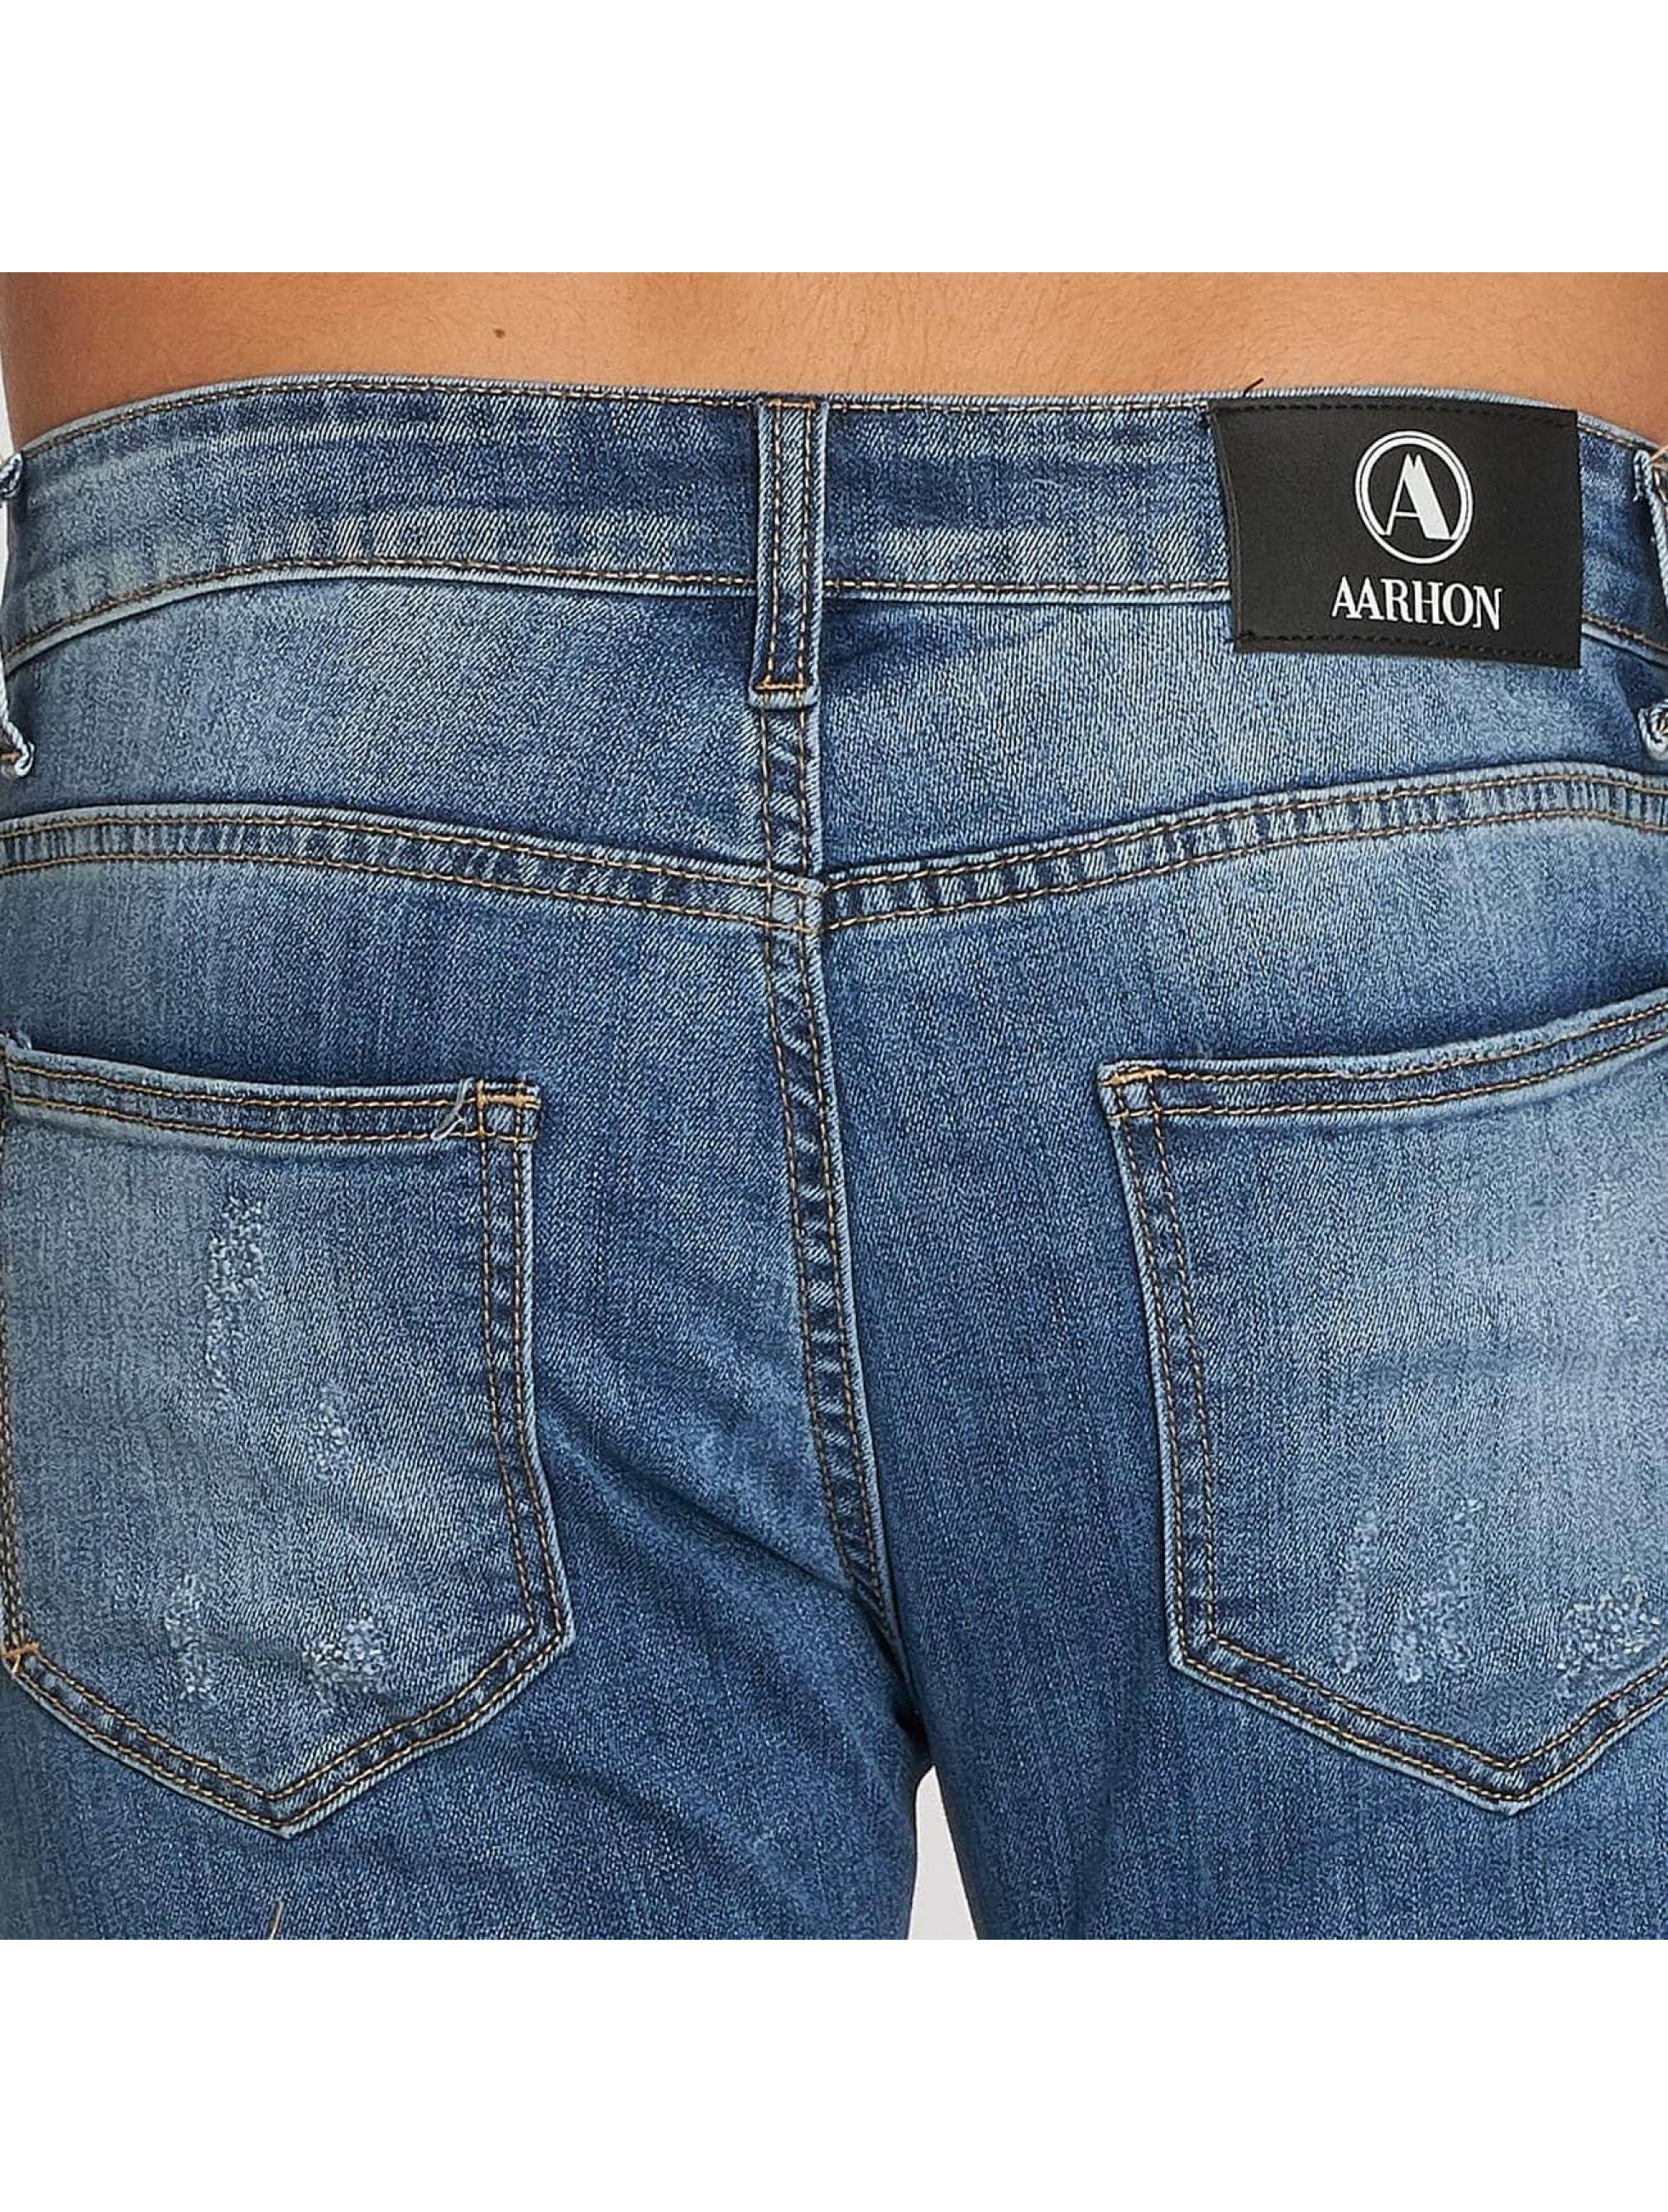 Aarhon Jean coupe droite Stripe bleu